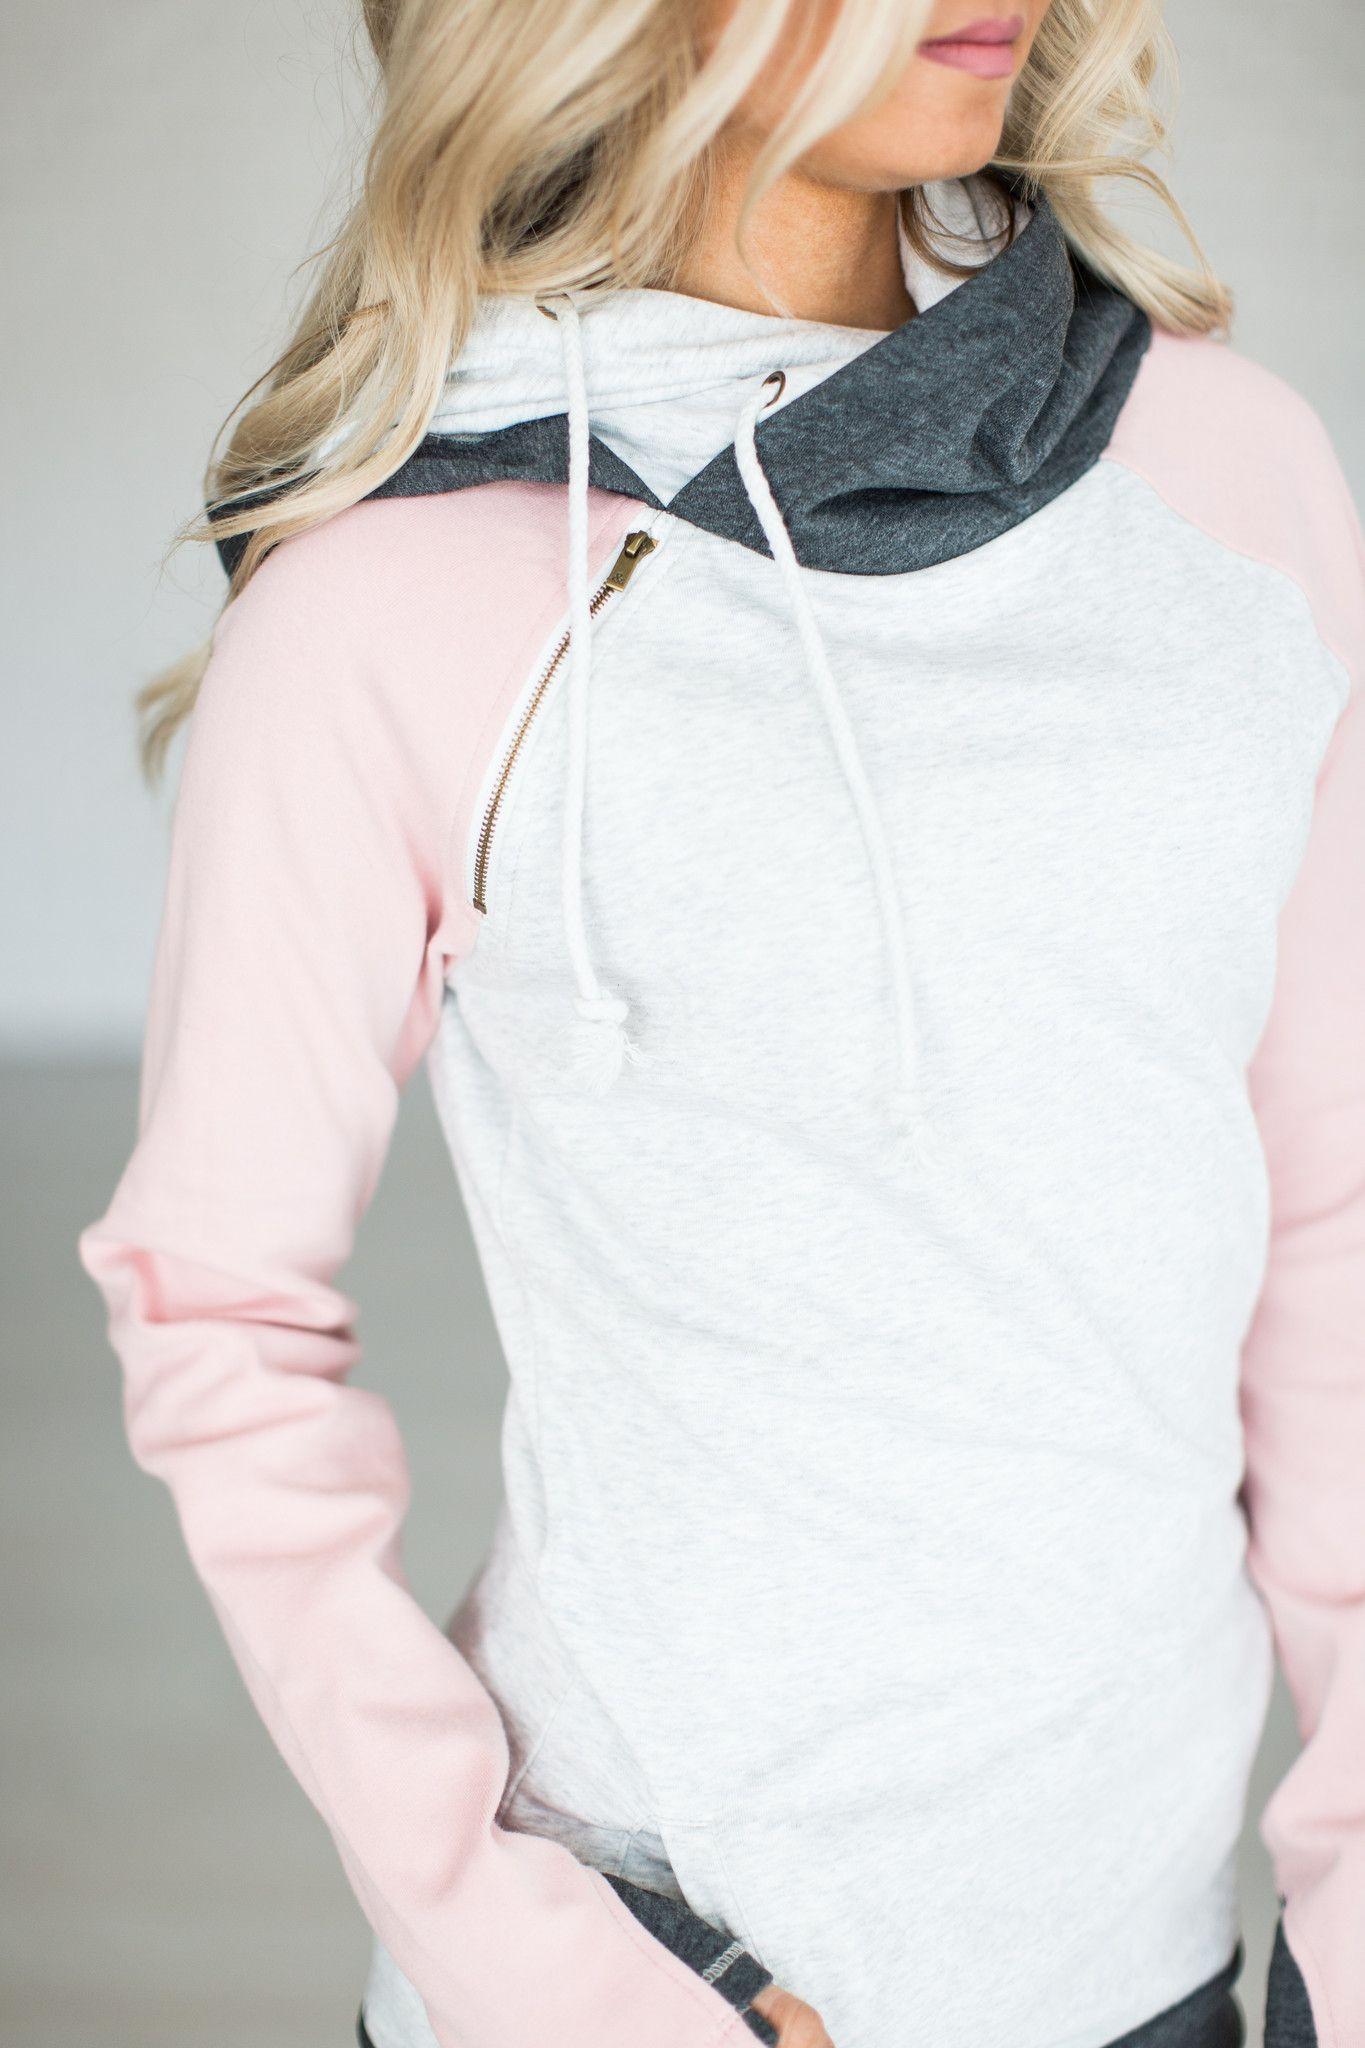 Pink sweater dress outfit  Baseball DoubleHood Sweatshirt  Pink  Sweatshirt Clothes and